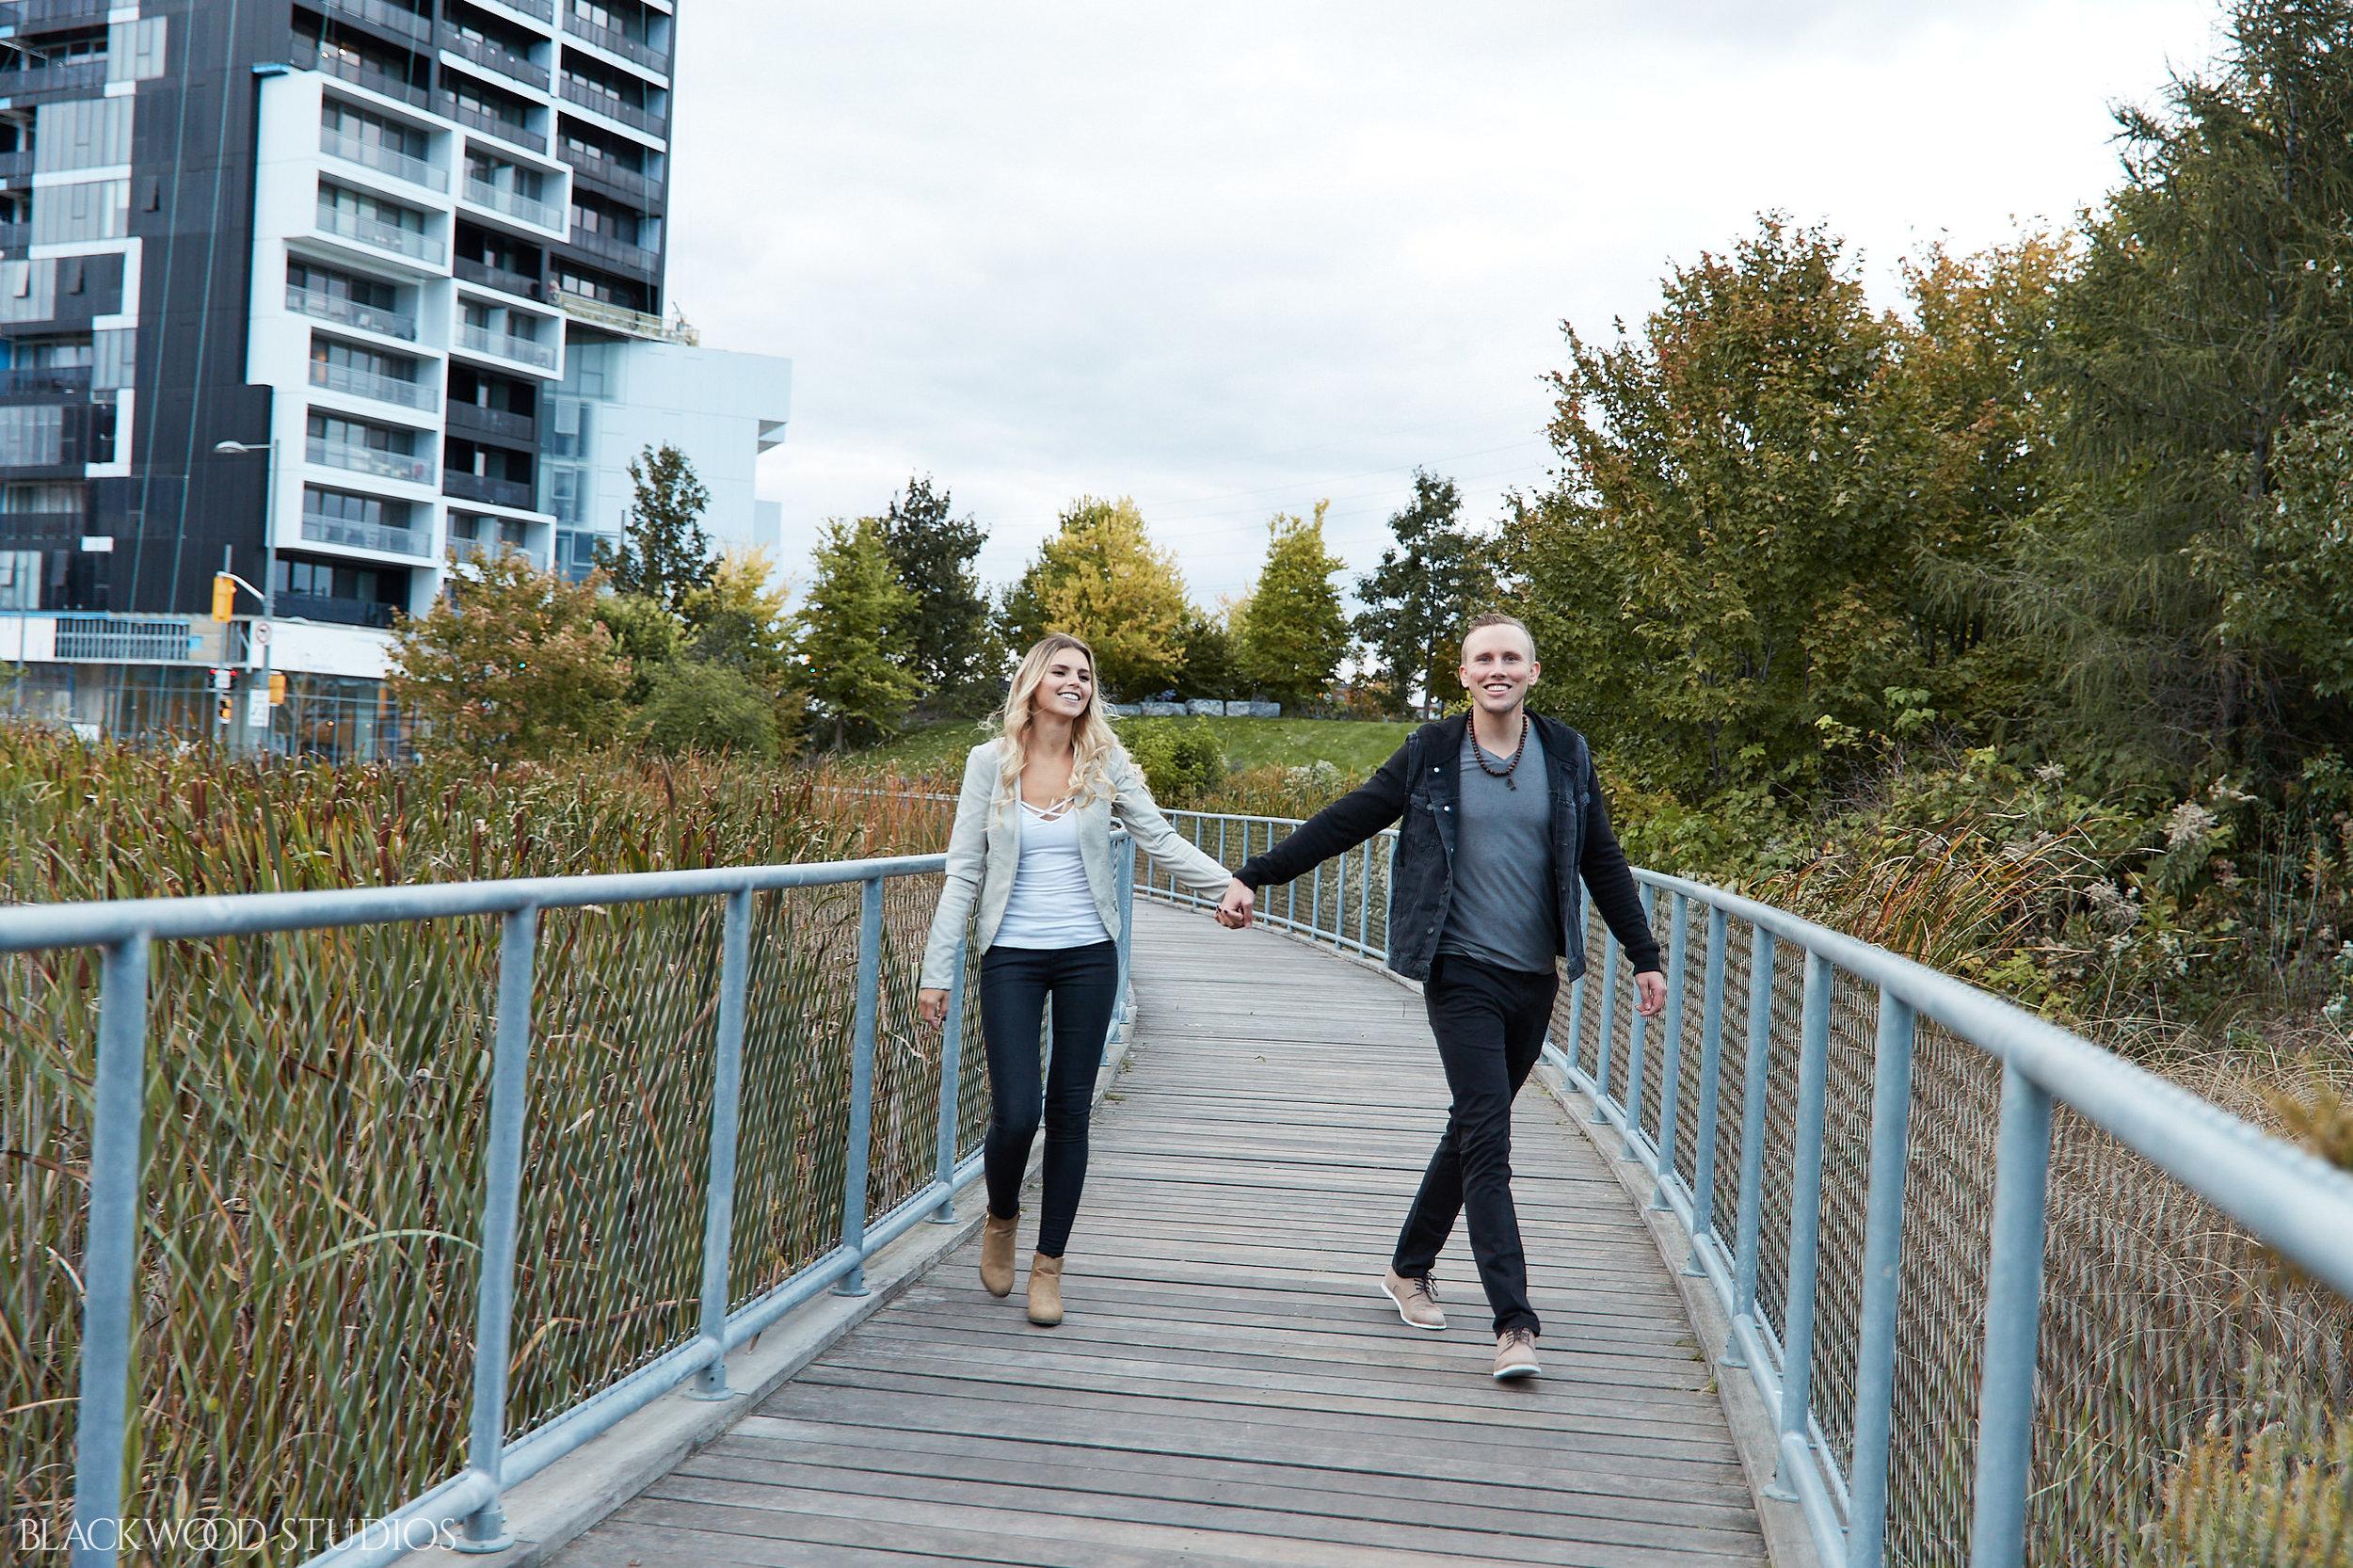 Blackwood-Studios-20181012-182314-Aleisha-and-Brad-Engagement-photography-Toronto-Ontario-Canada-Corktown-Common.jpg